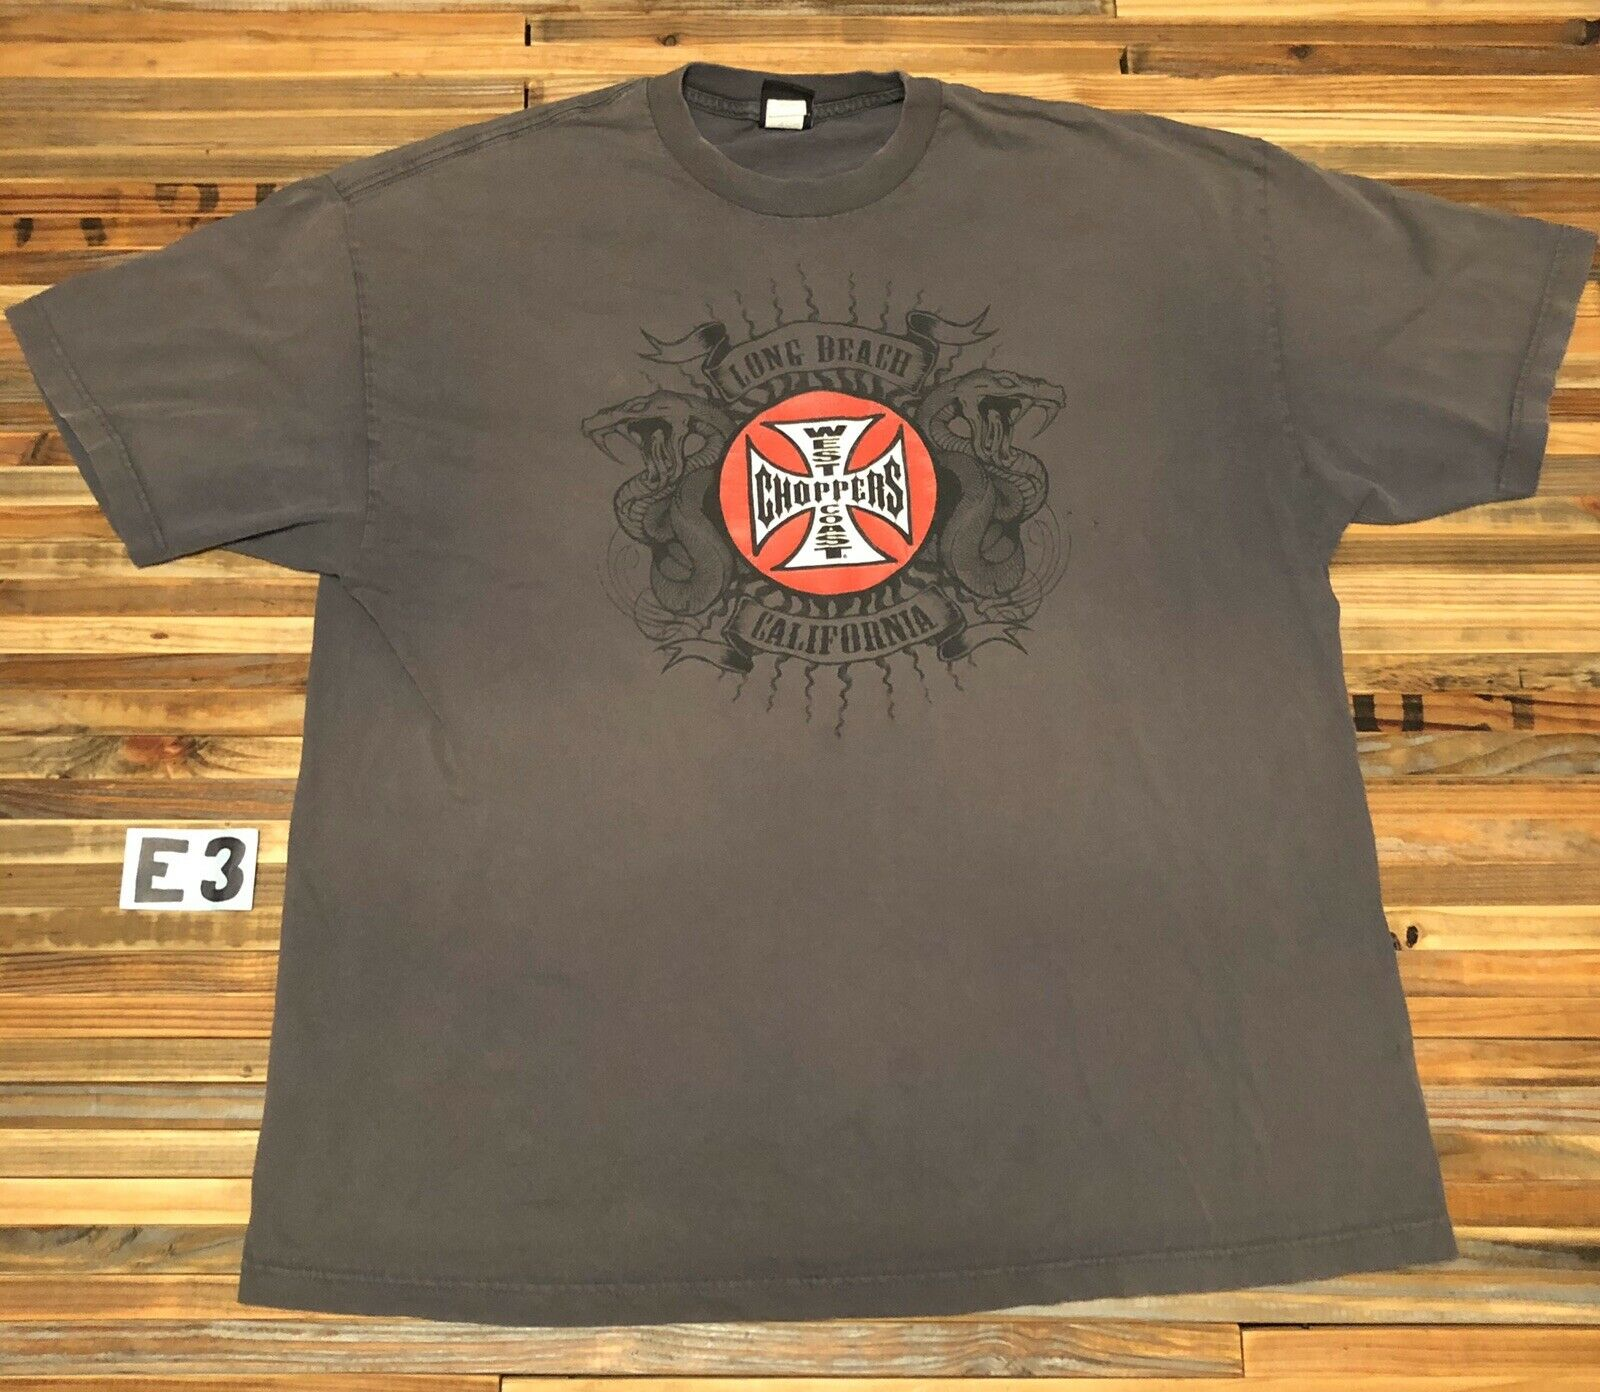 Camiseta Vintage West Coast Choppers para hombre Xxl 2Xl, gran Logo gris